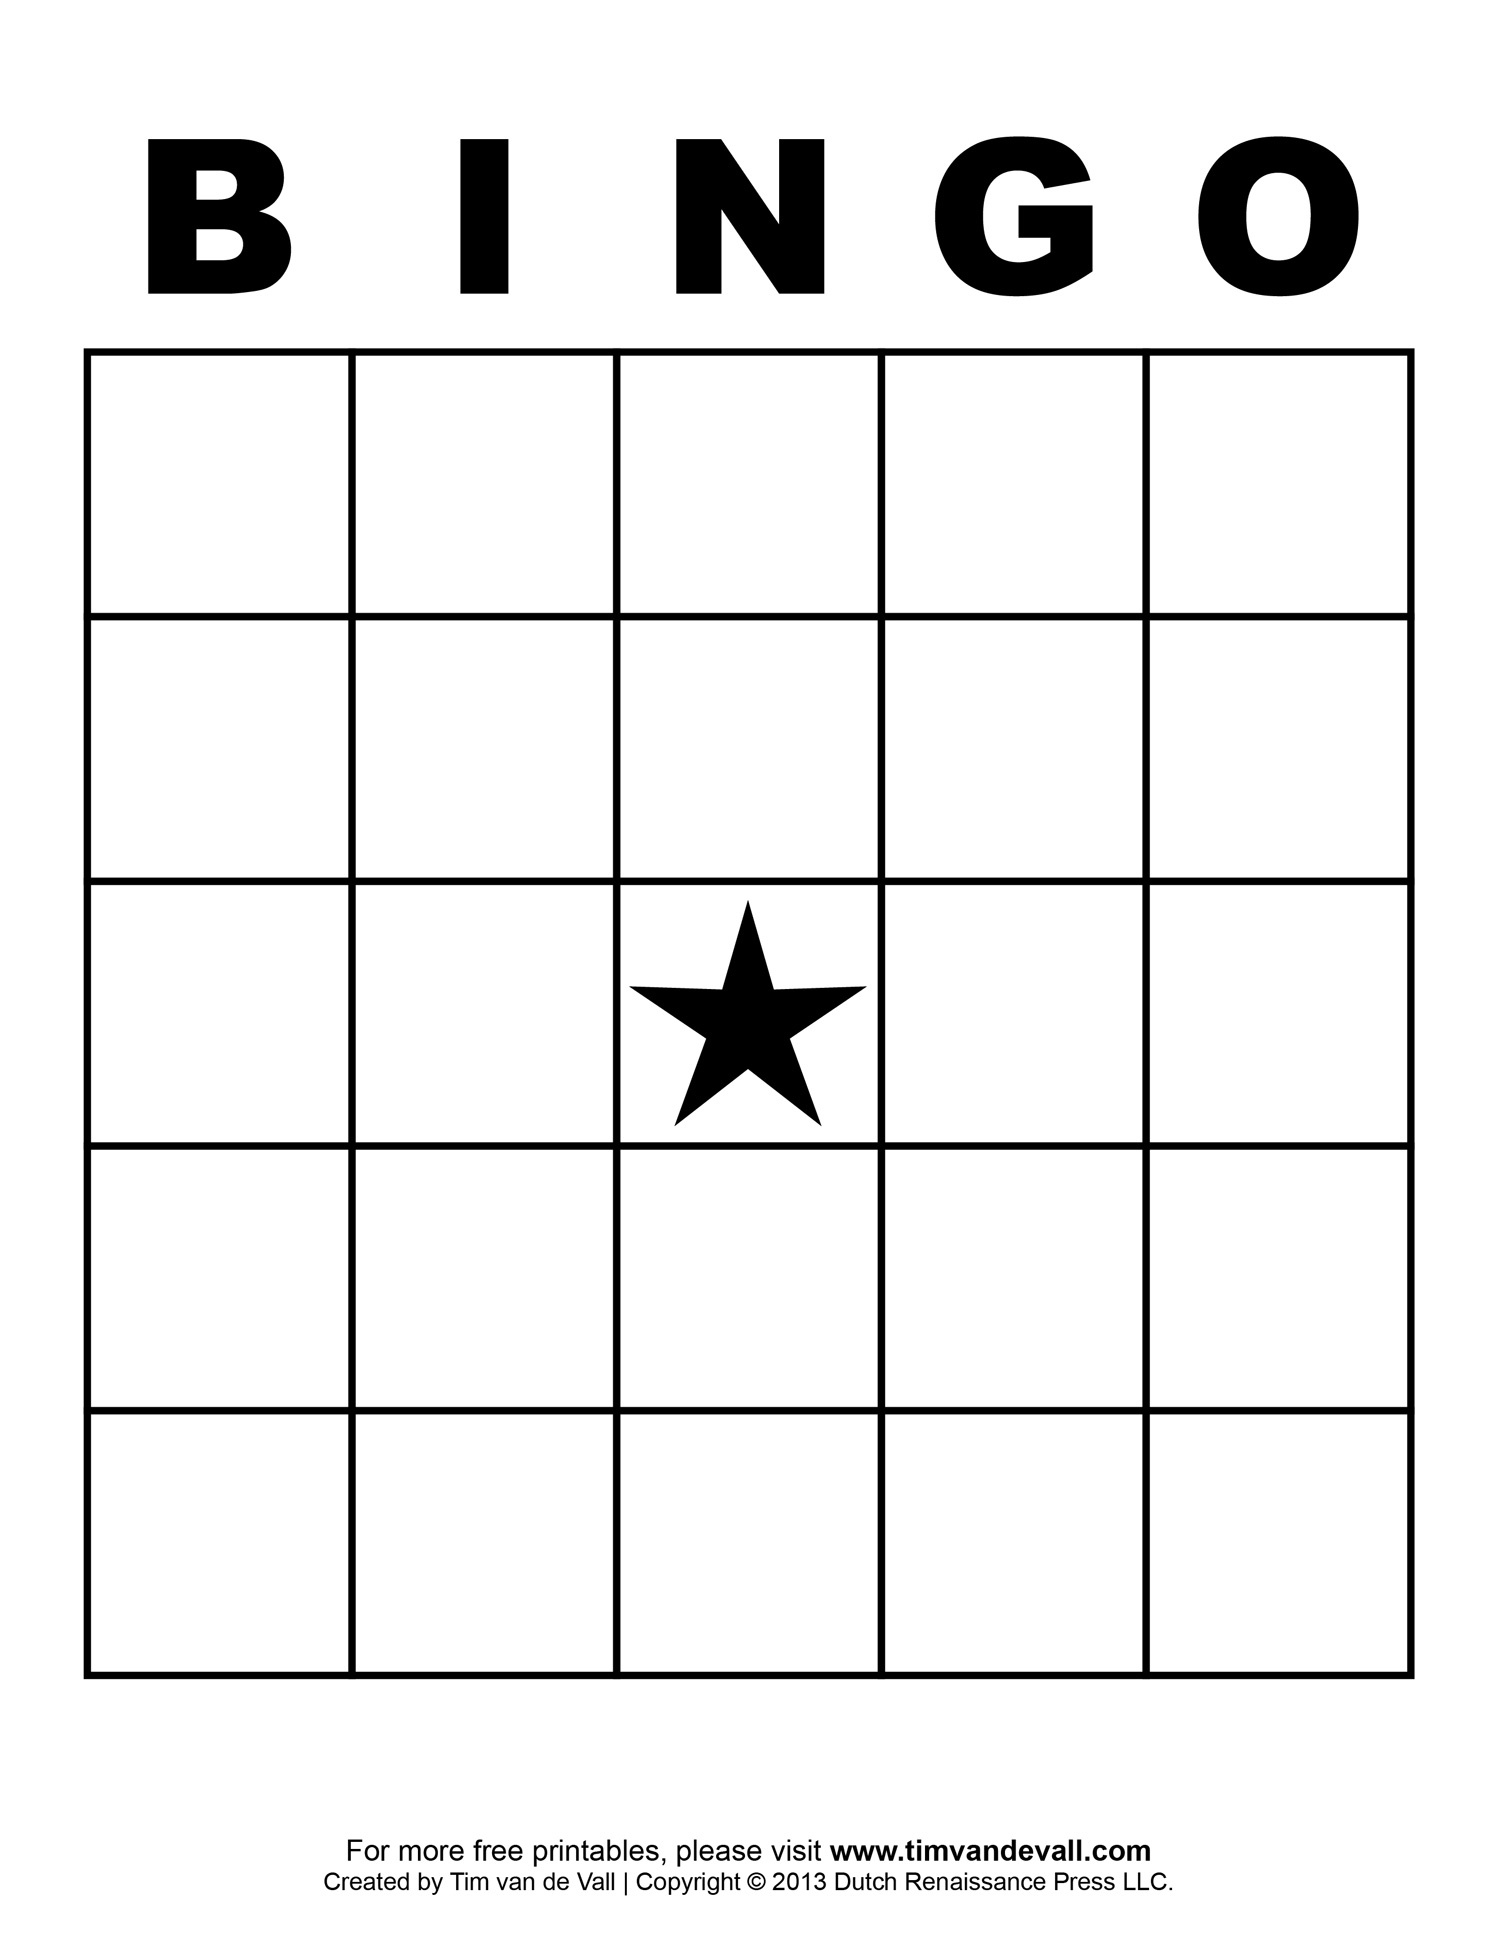 Blank Bingo Template - Tim's Printables - Free Bingo Patterns Printable